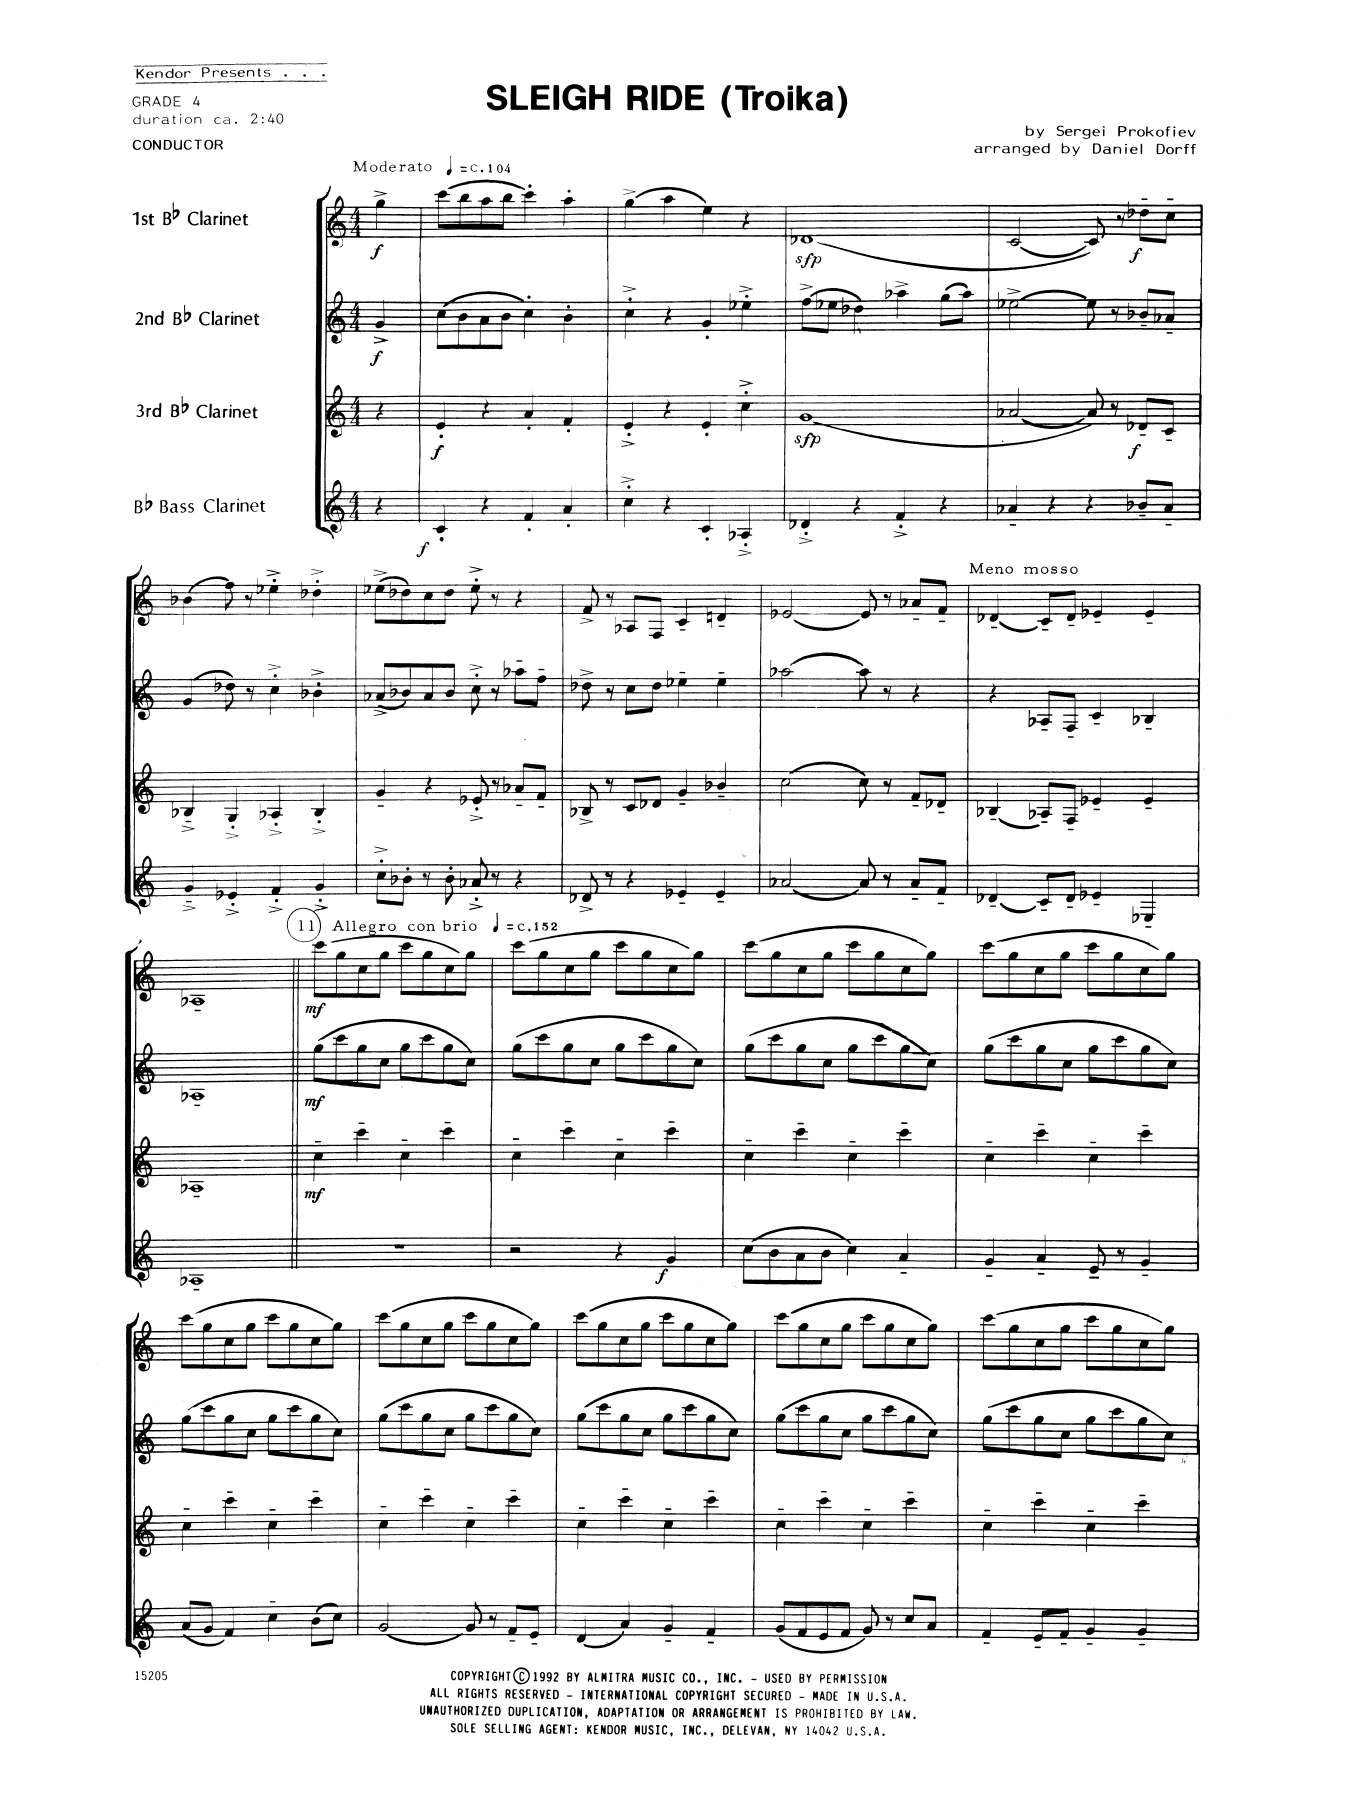 Sleigh Ride (Troika) (COMPLETE) sheet music for clarinet quartet by Daniel Dorff